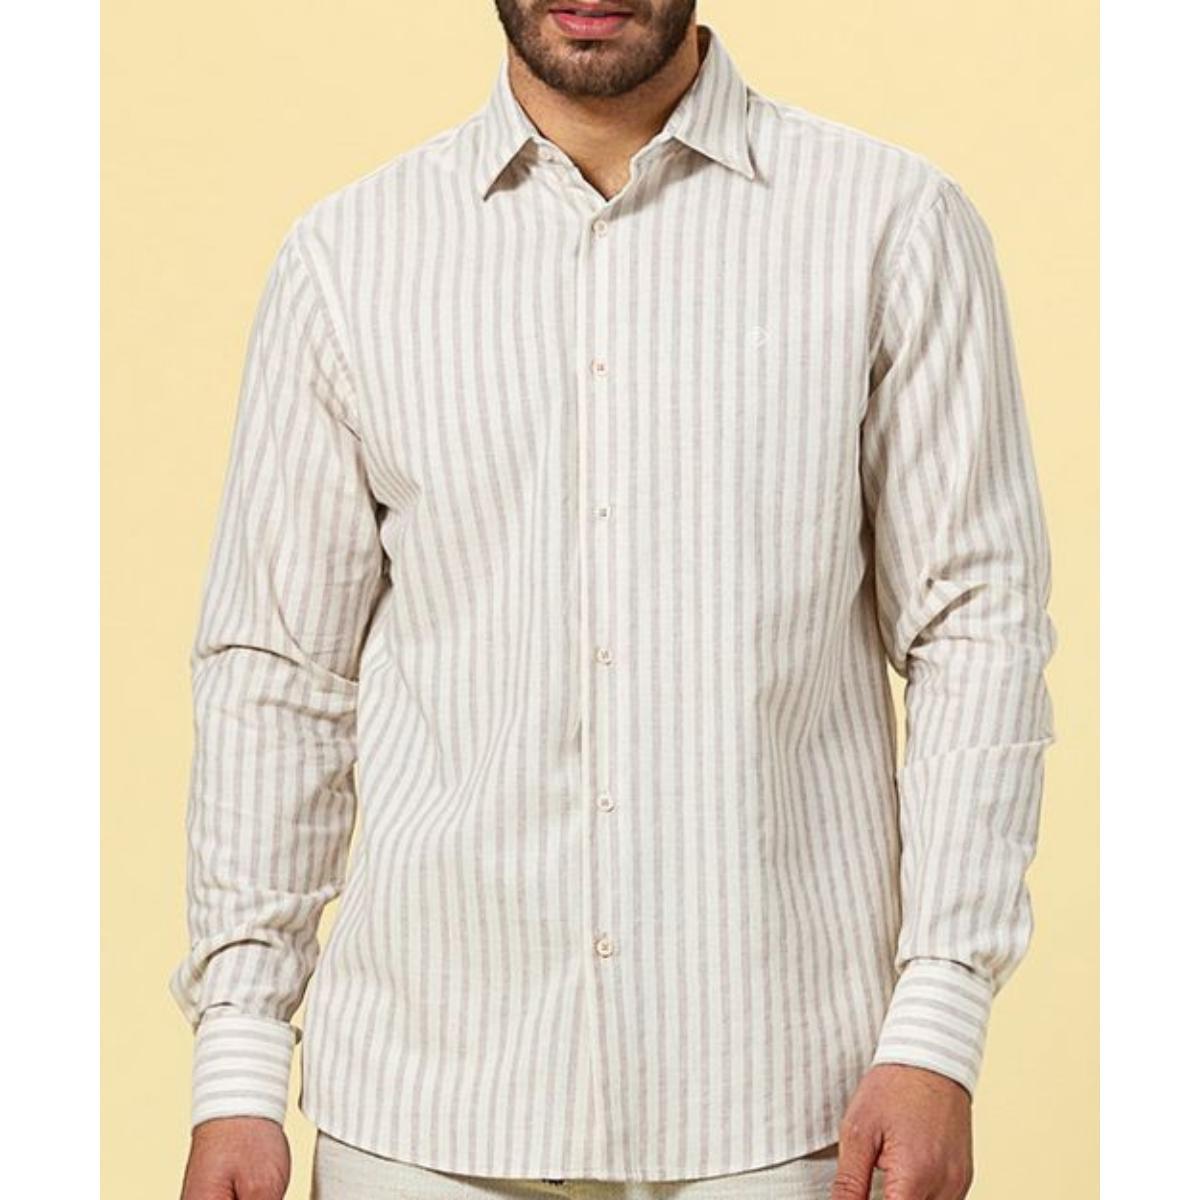 Camisa Masculina Forum 314603043 Vf369 Bege Listrado